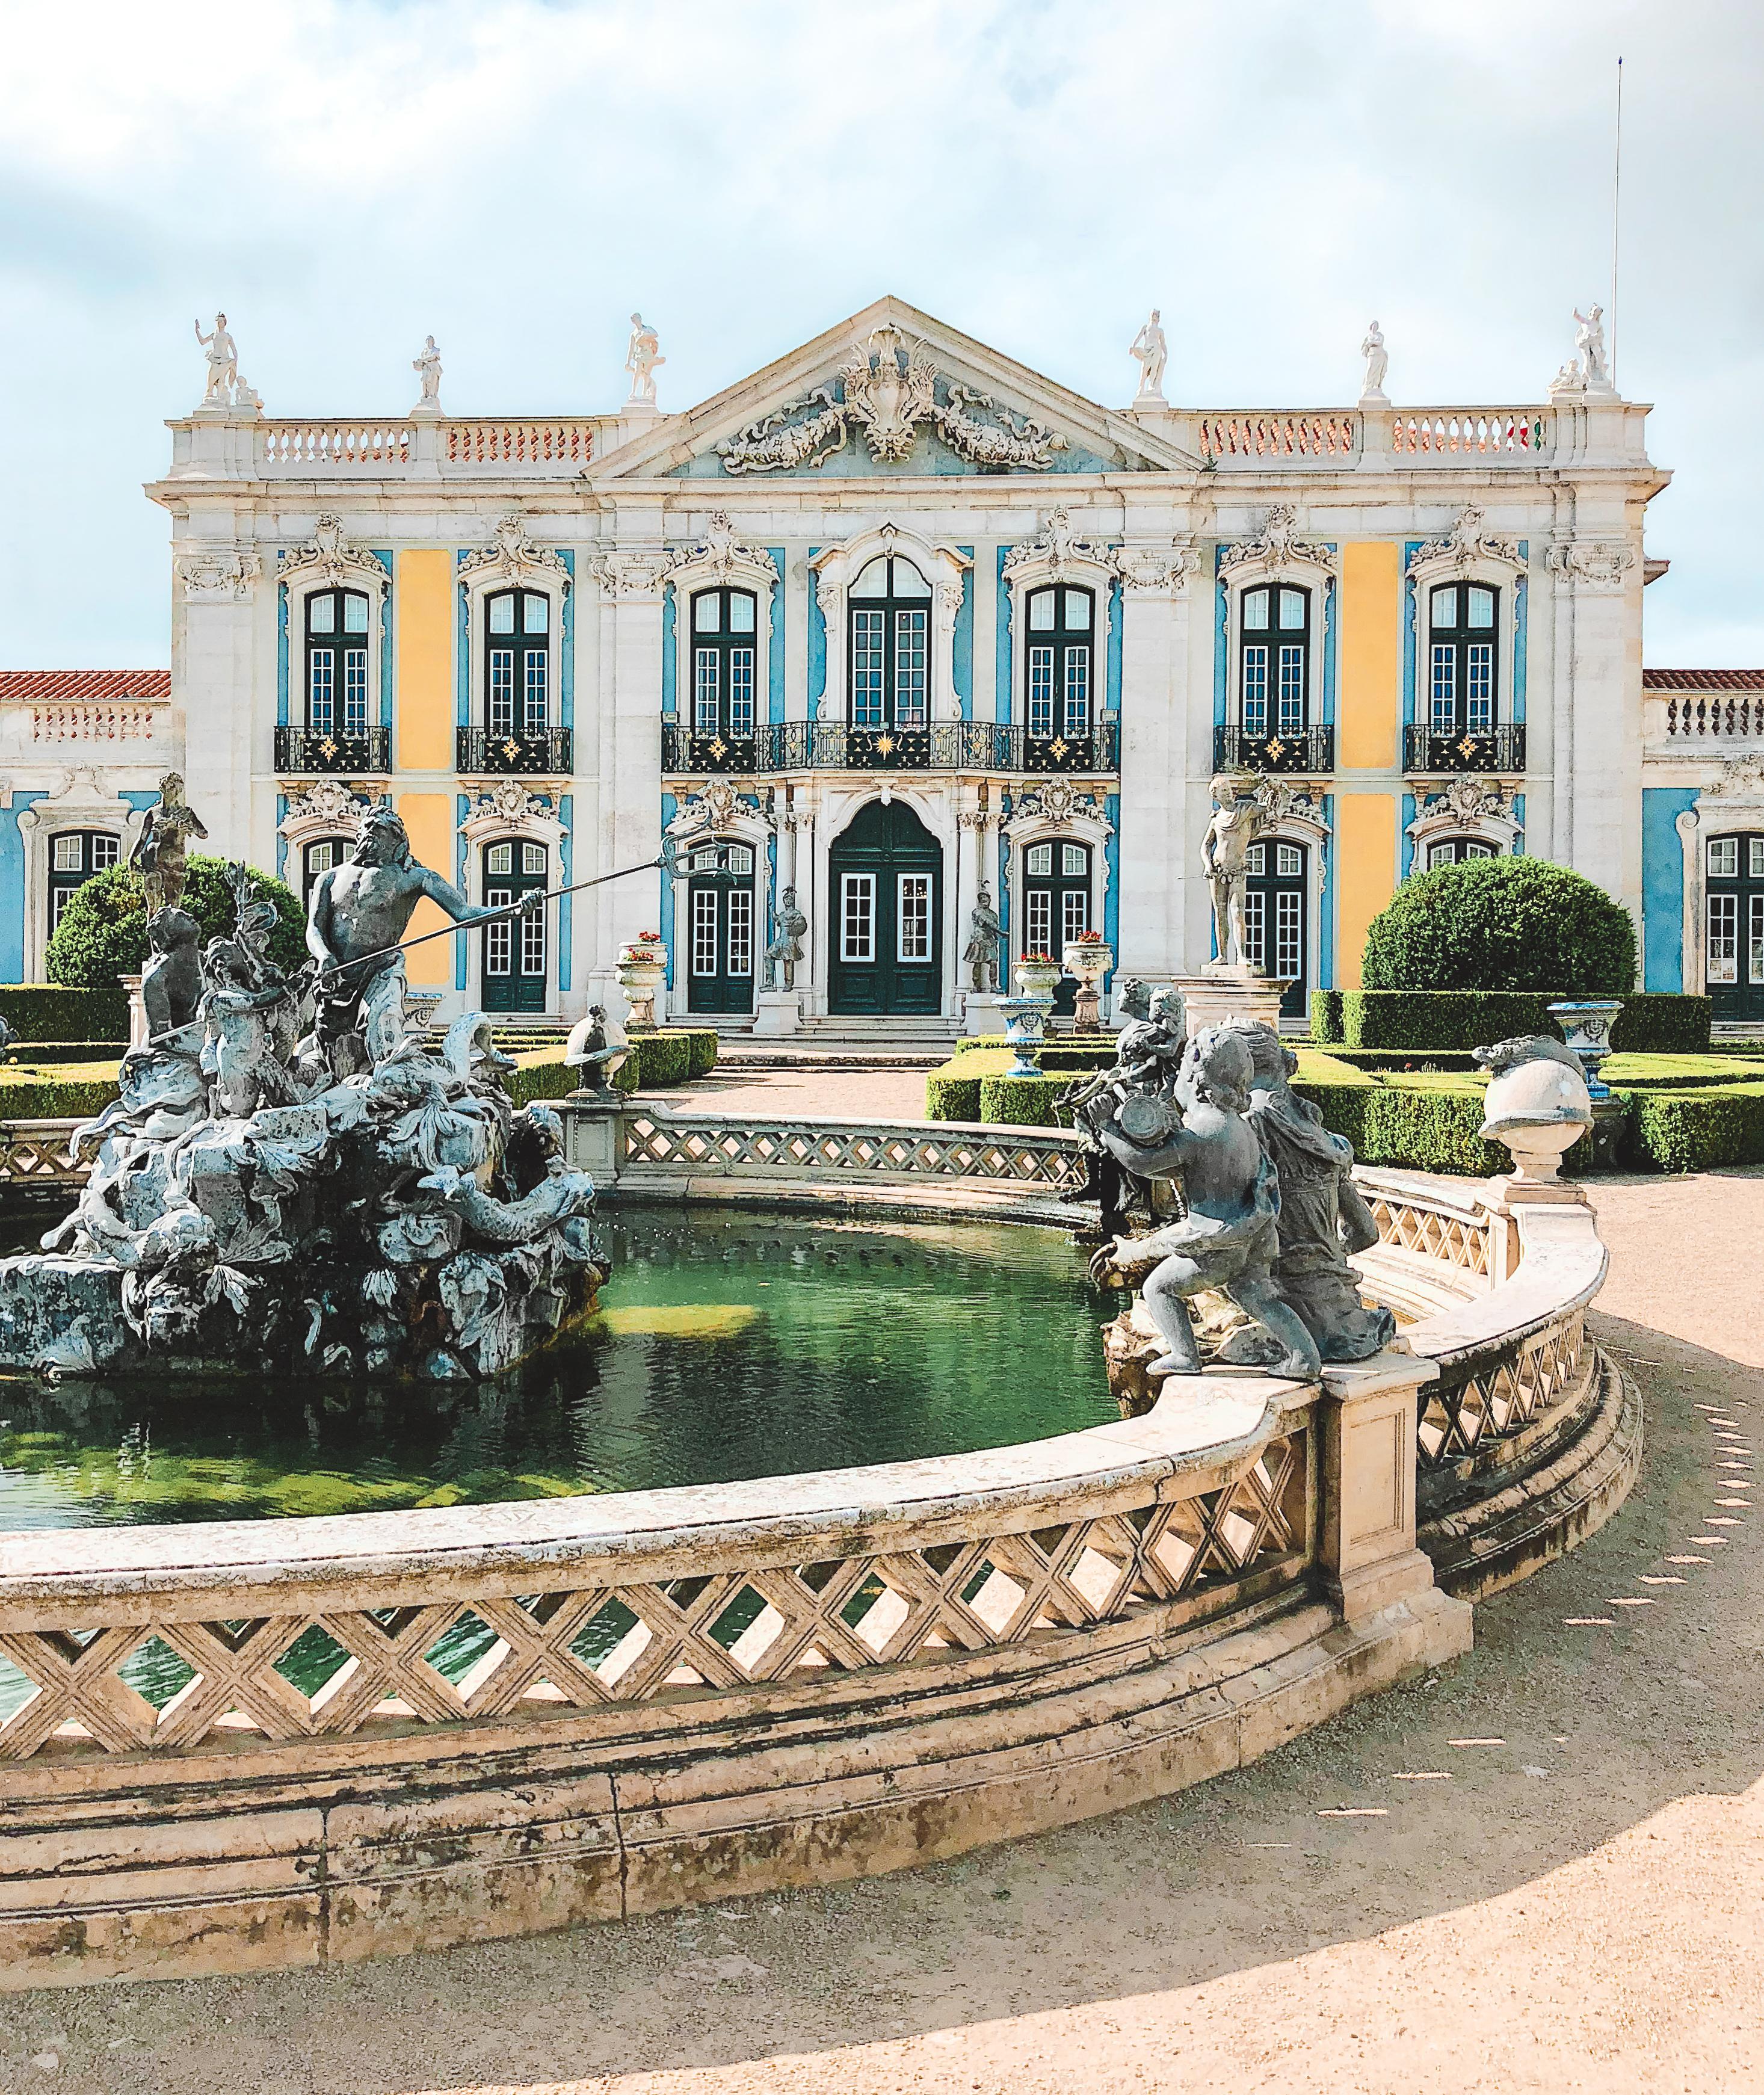 Muslim-travel-guide-Sintra-Portugal-Palace-of-Queluz-exterior